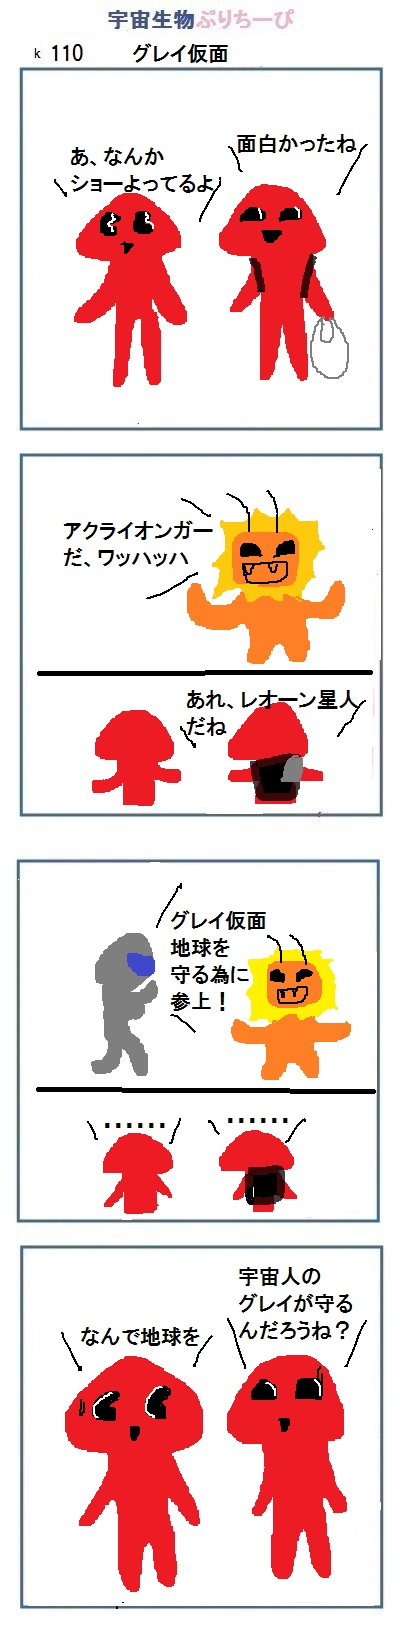 160923_k110.jpg